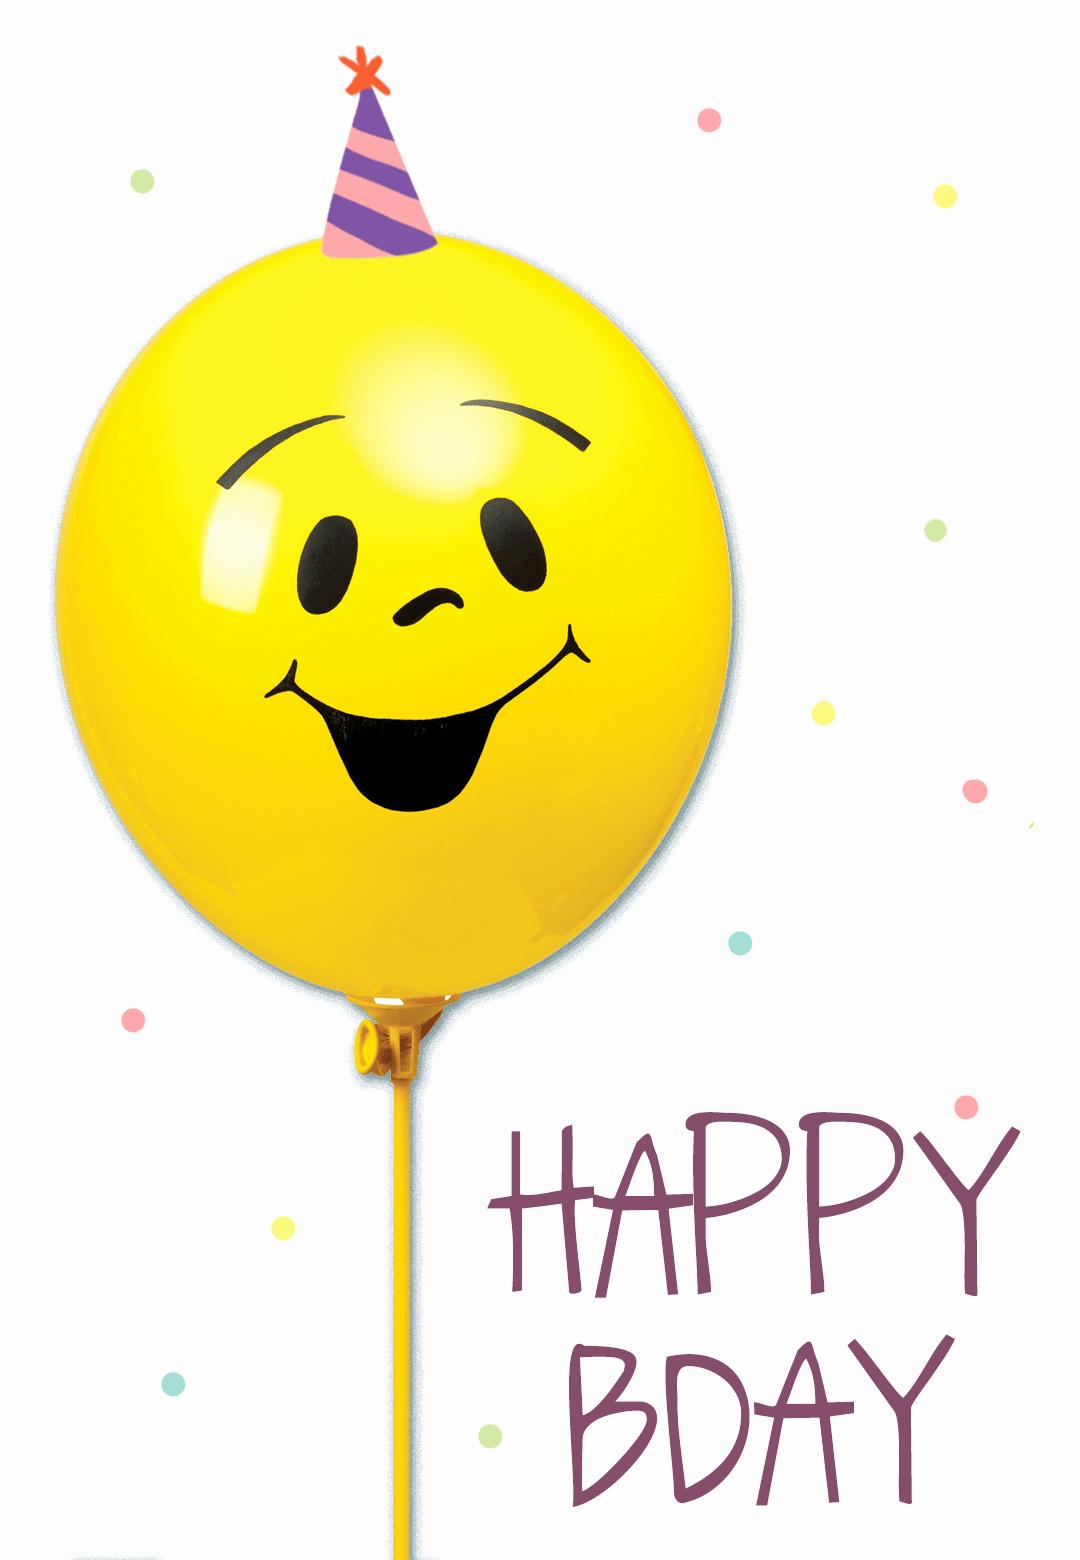 Funny Free Printable Birthday Cards Fresh Smiley Yellow Balloon Birthday Card